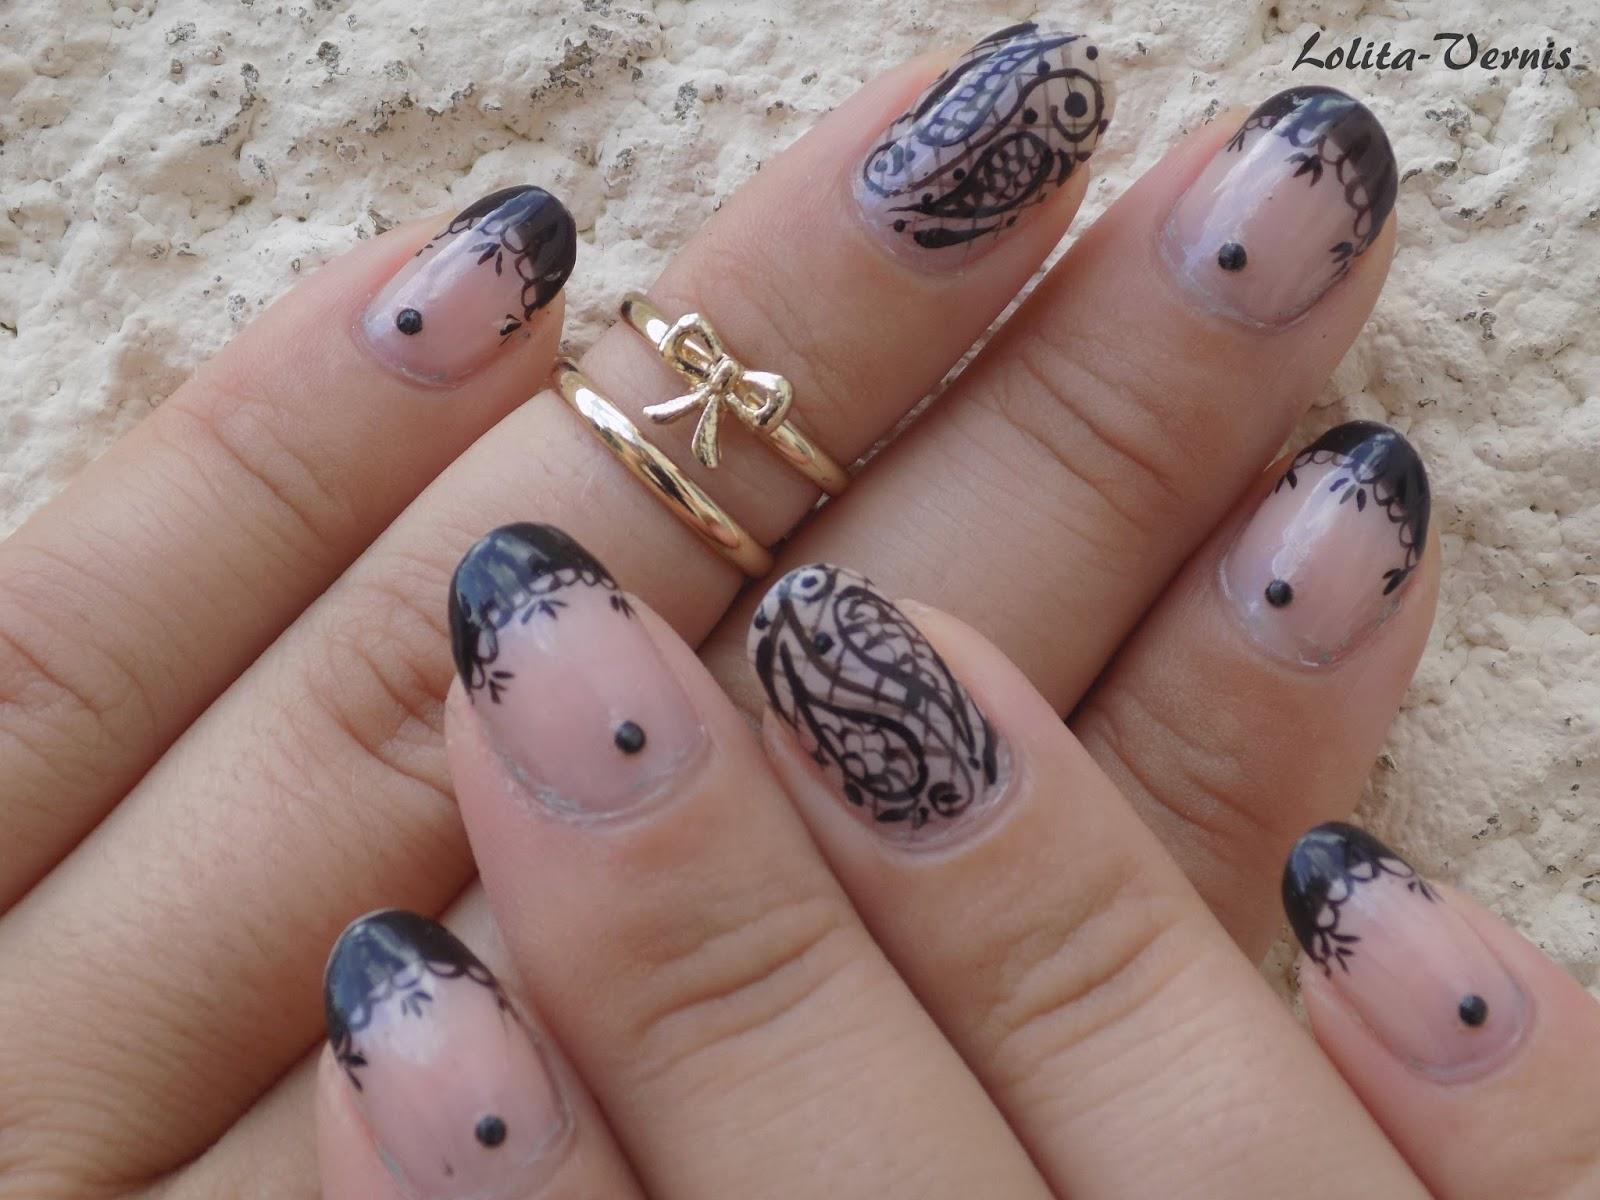 French Manucure Originale pour lolita-vernis nail-art: [nail-art #34] : french manucure baroque